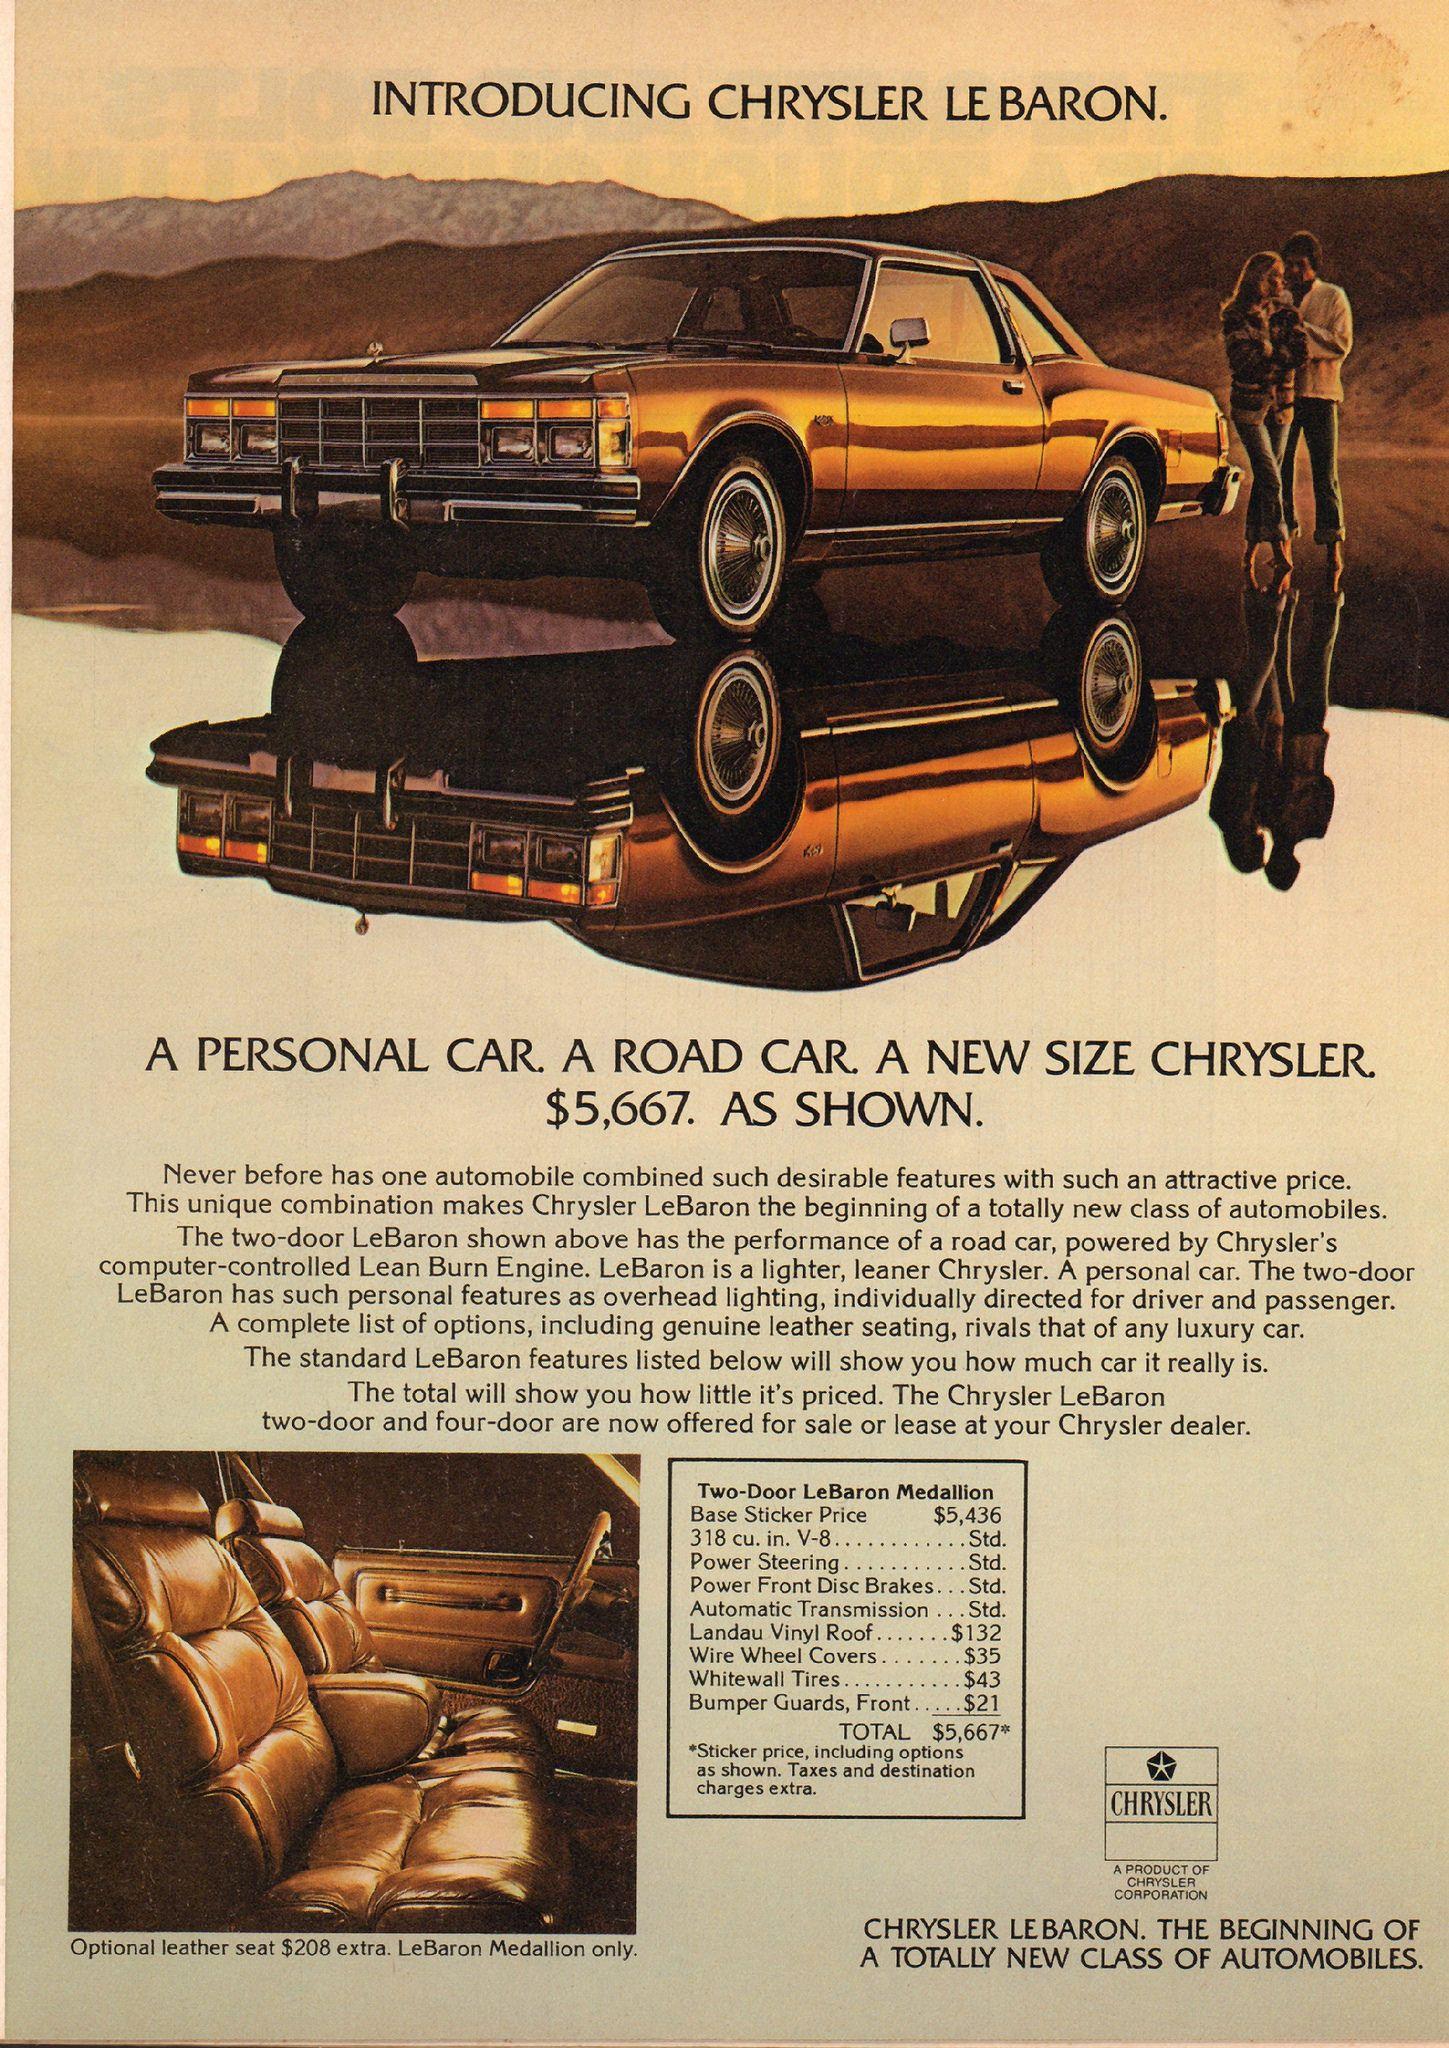 1977 Chrysler Le Baron Advertisement Motor Trend June 1977 Classic Chevy Trucks Vintage Cars Chrysler Cars